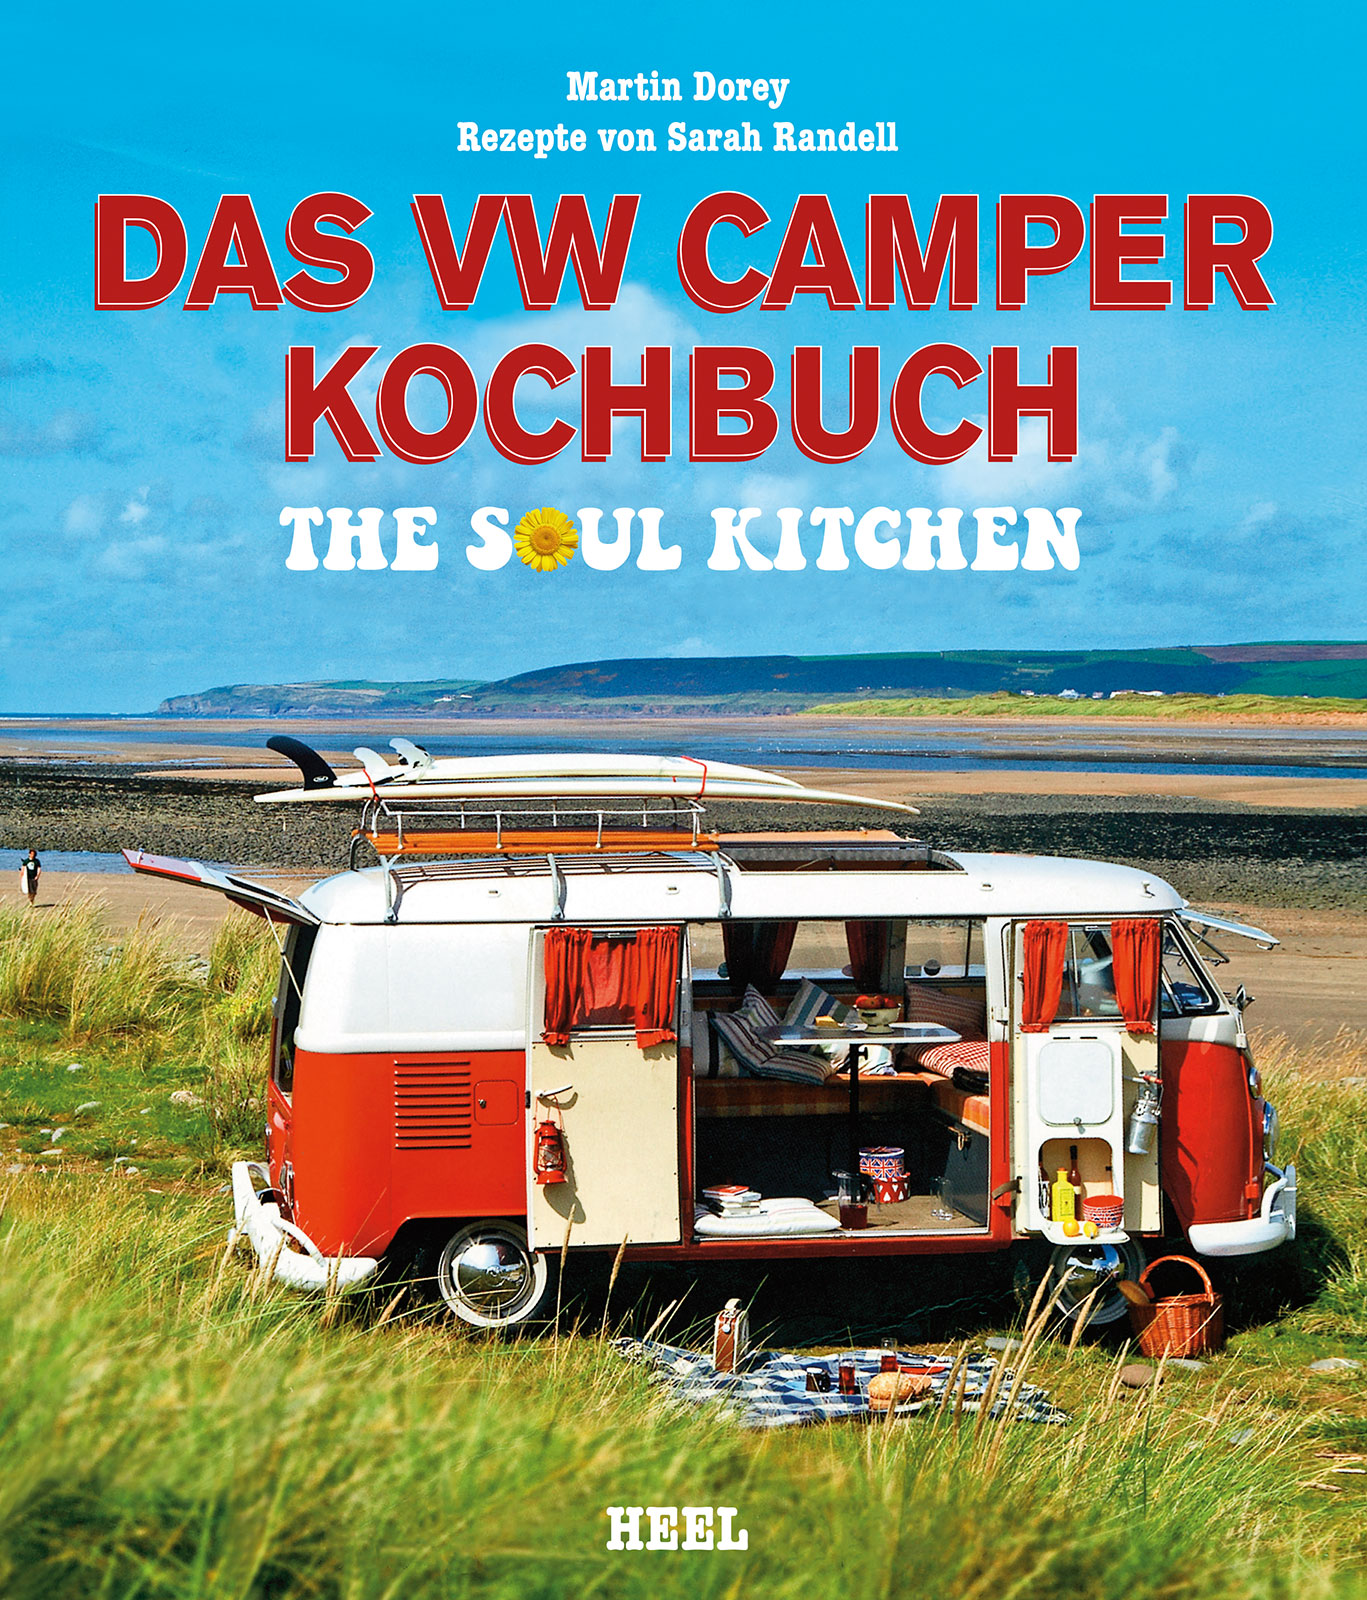 Das VW Camper Kochbuch: The Soul Kitchen - Martin Dorey